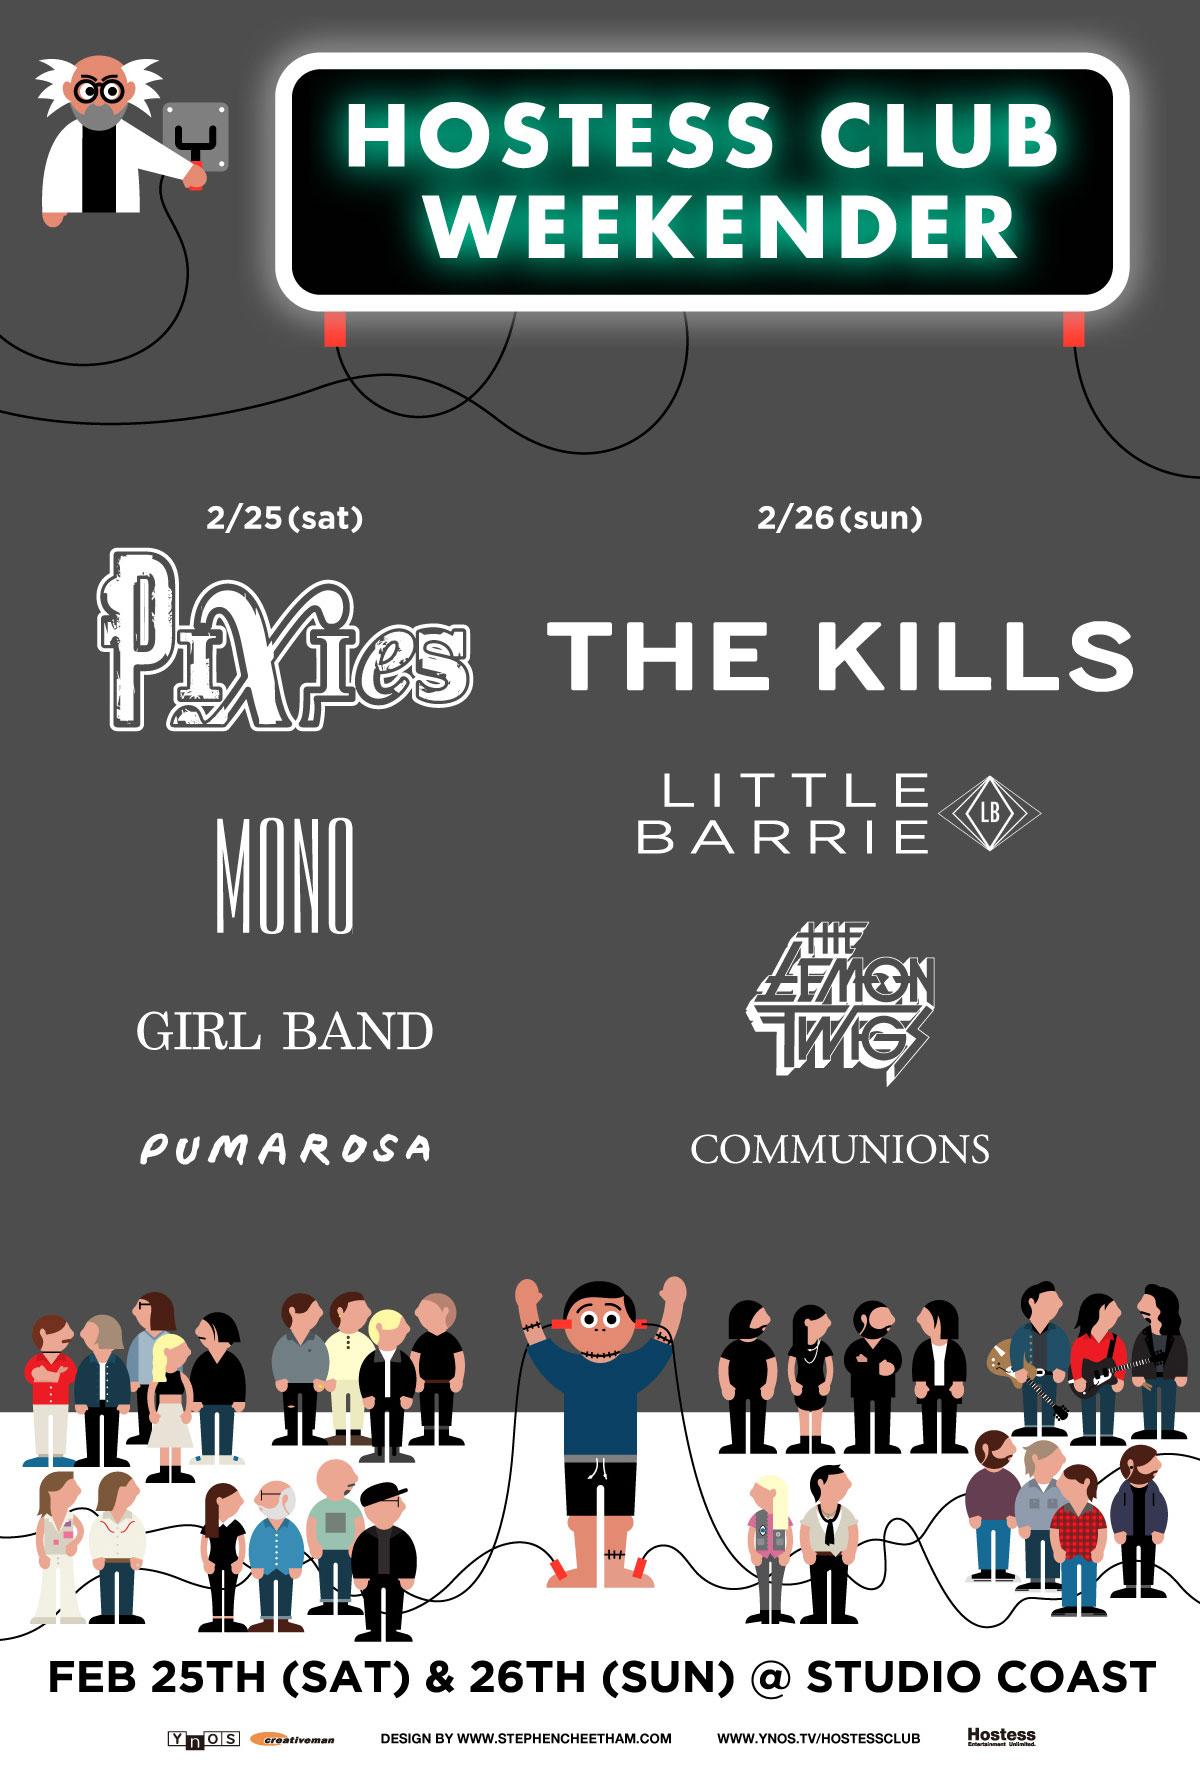 thekills, pixies, mono, hostessclubweekender, LittleBarrie, Communions